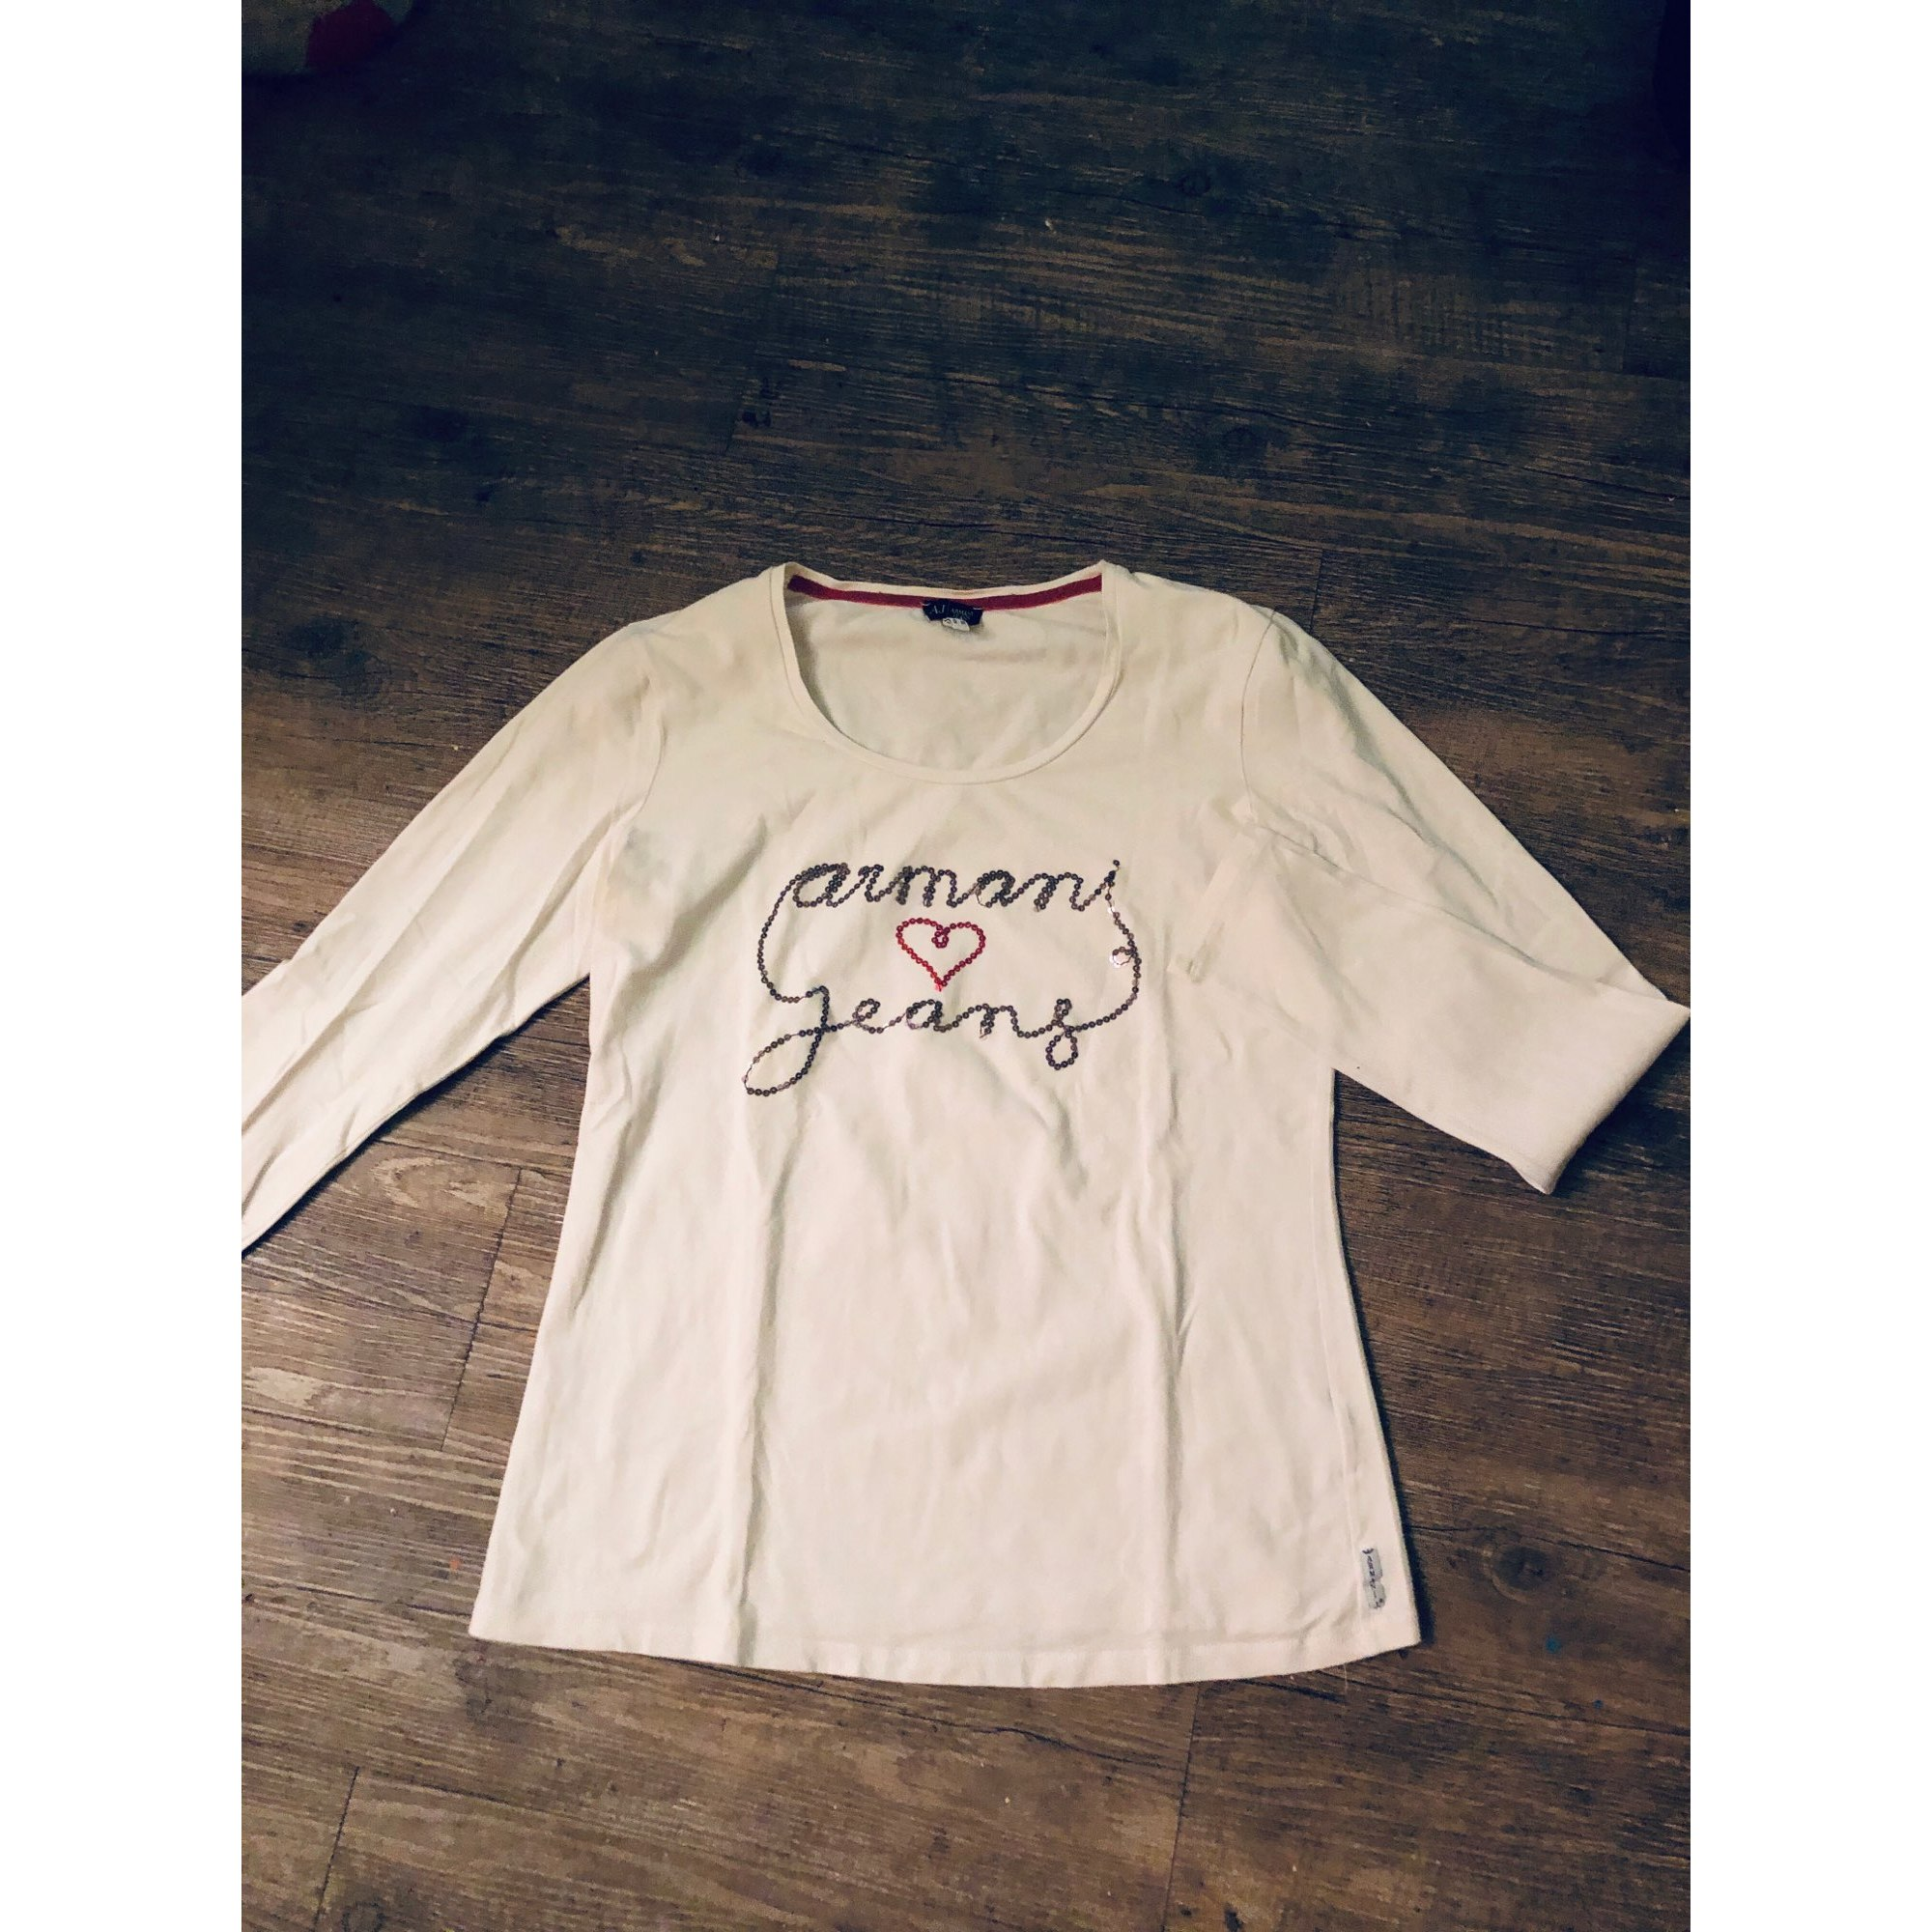 Top, tee-shirt ARMANI JEANS Blanc, blanc cassé, écru